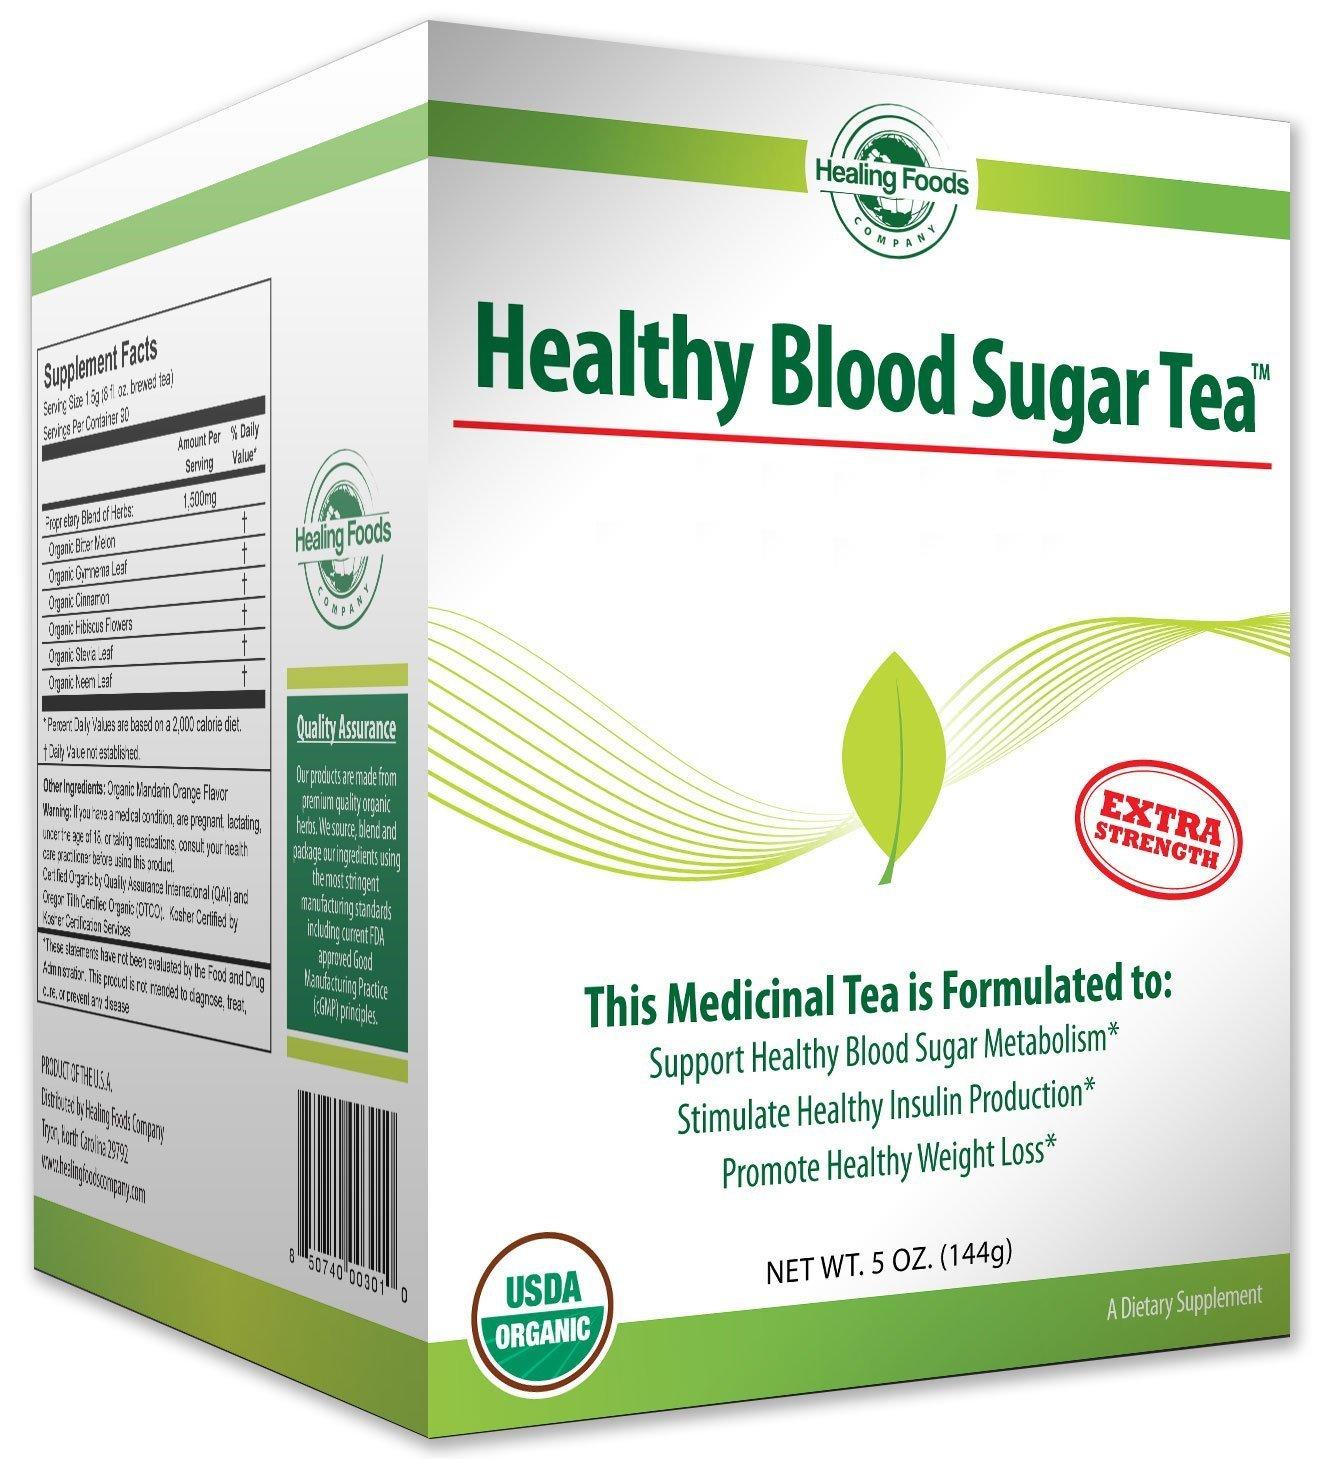 Healing Foods Non-GMO Gluten-Free Organic Blood Sugar Tea with eBook, 30 Day Supply, 5 oz, 90 Servings